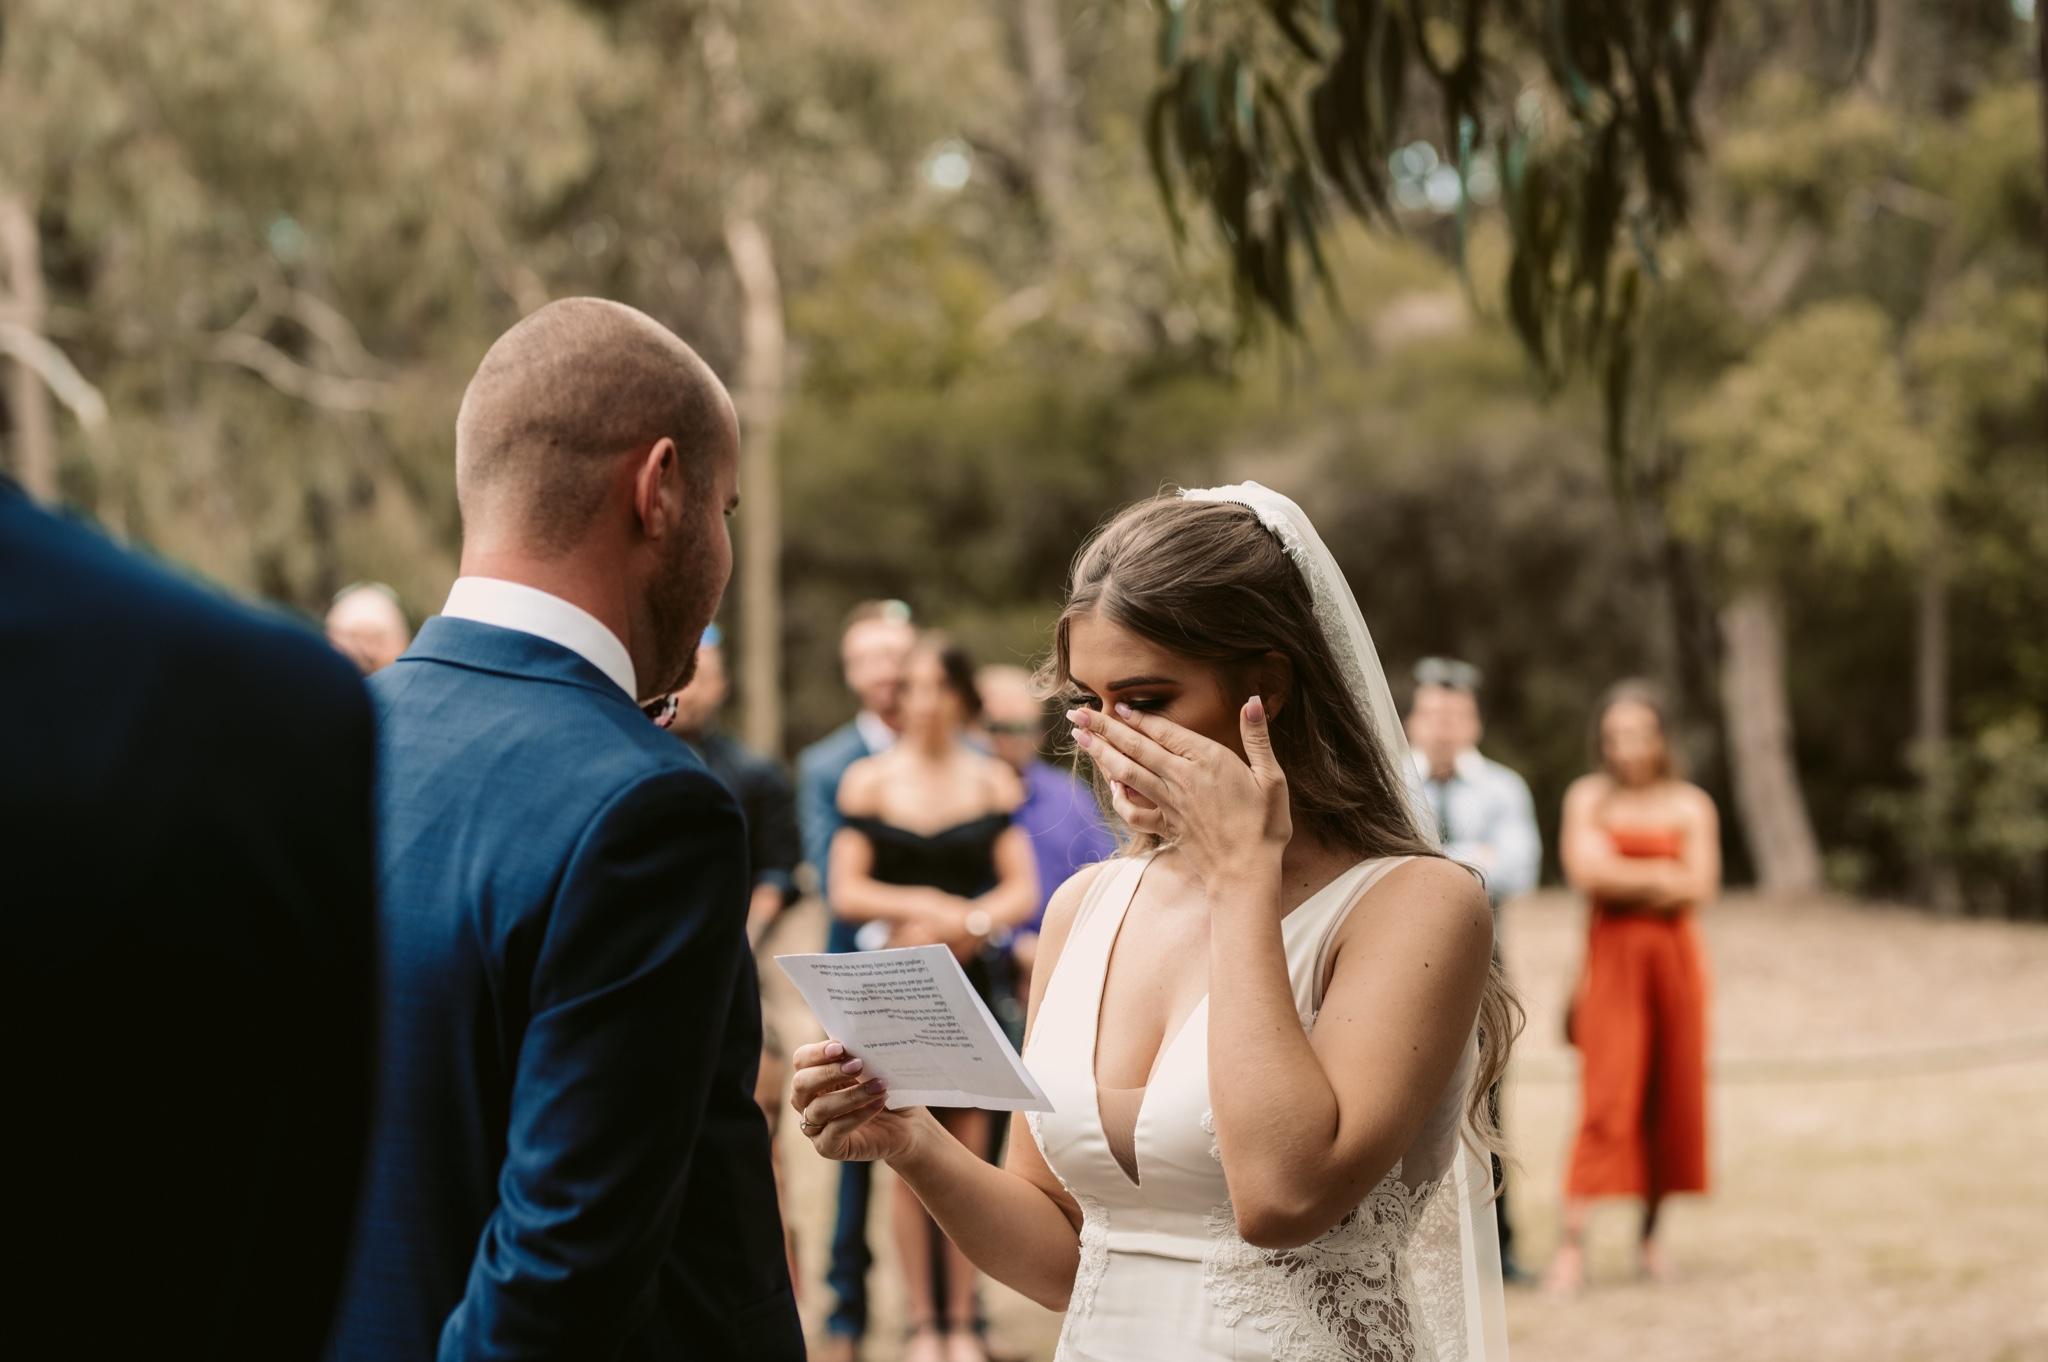 Mornington Peninsula Wedding Photography54.jpg